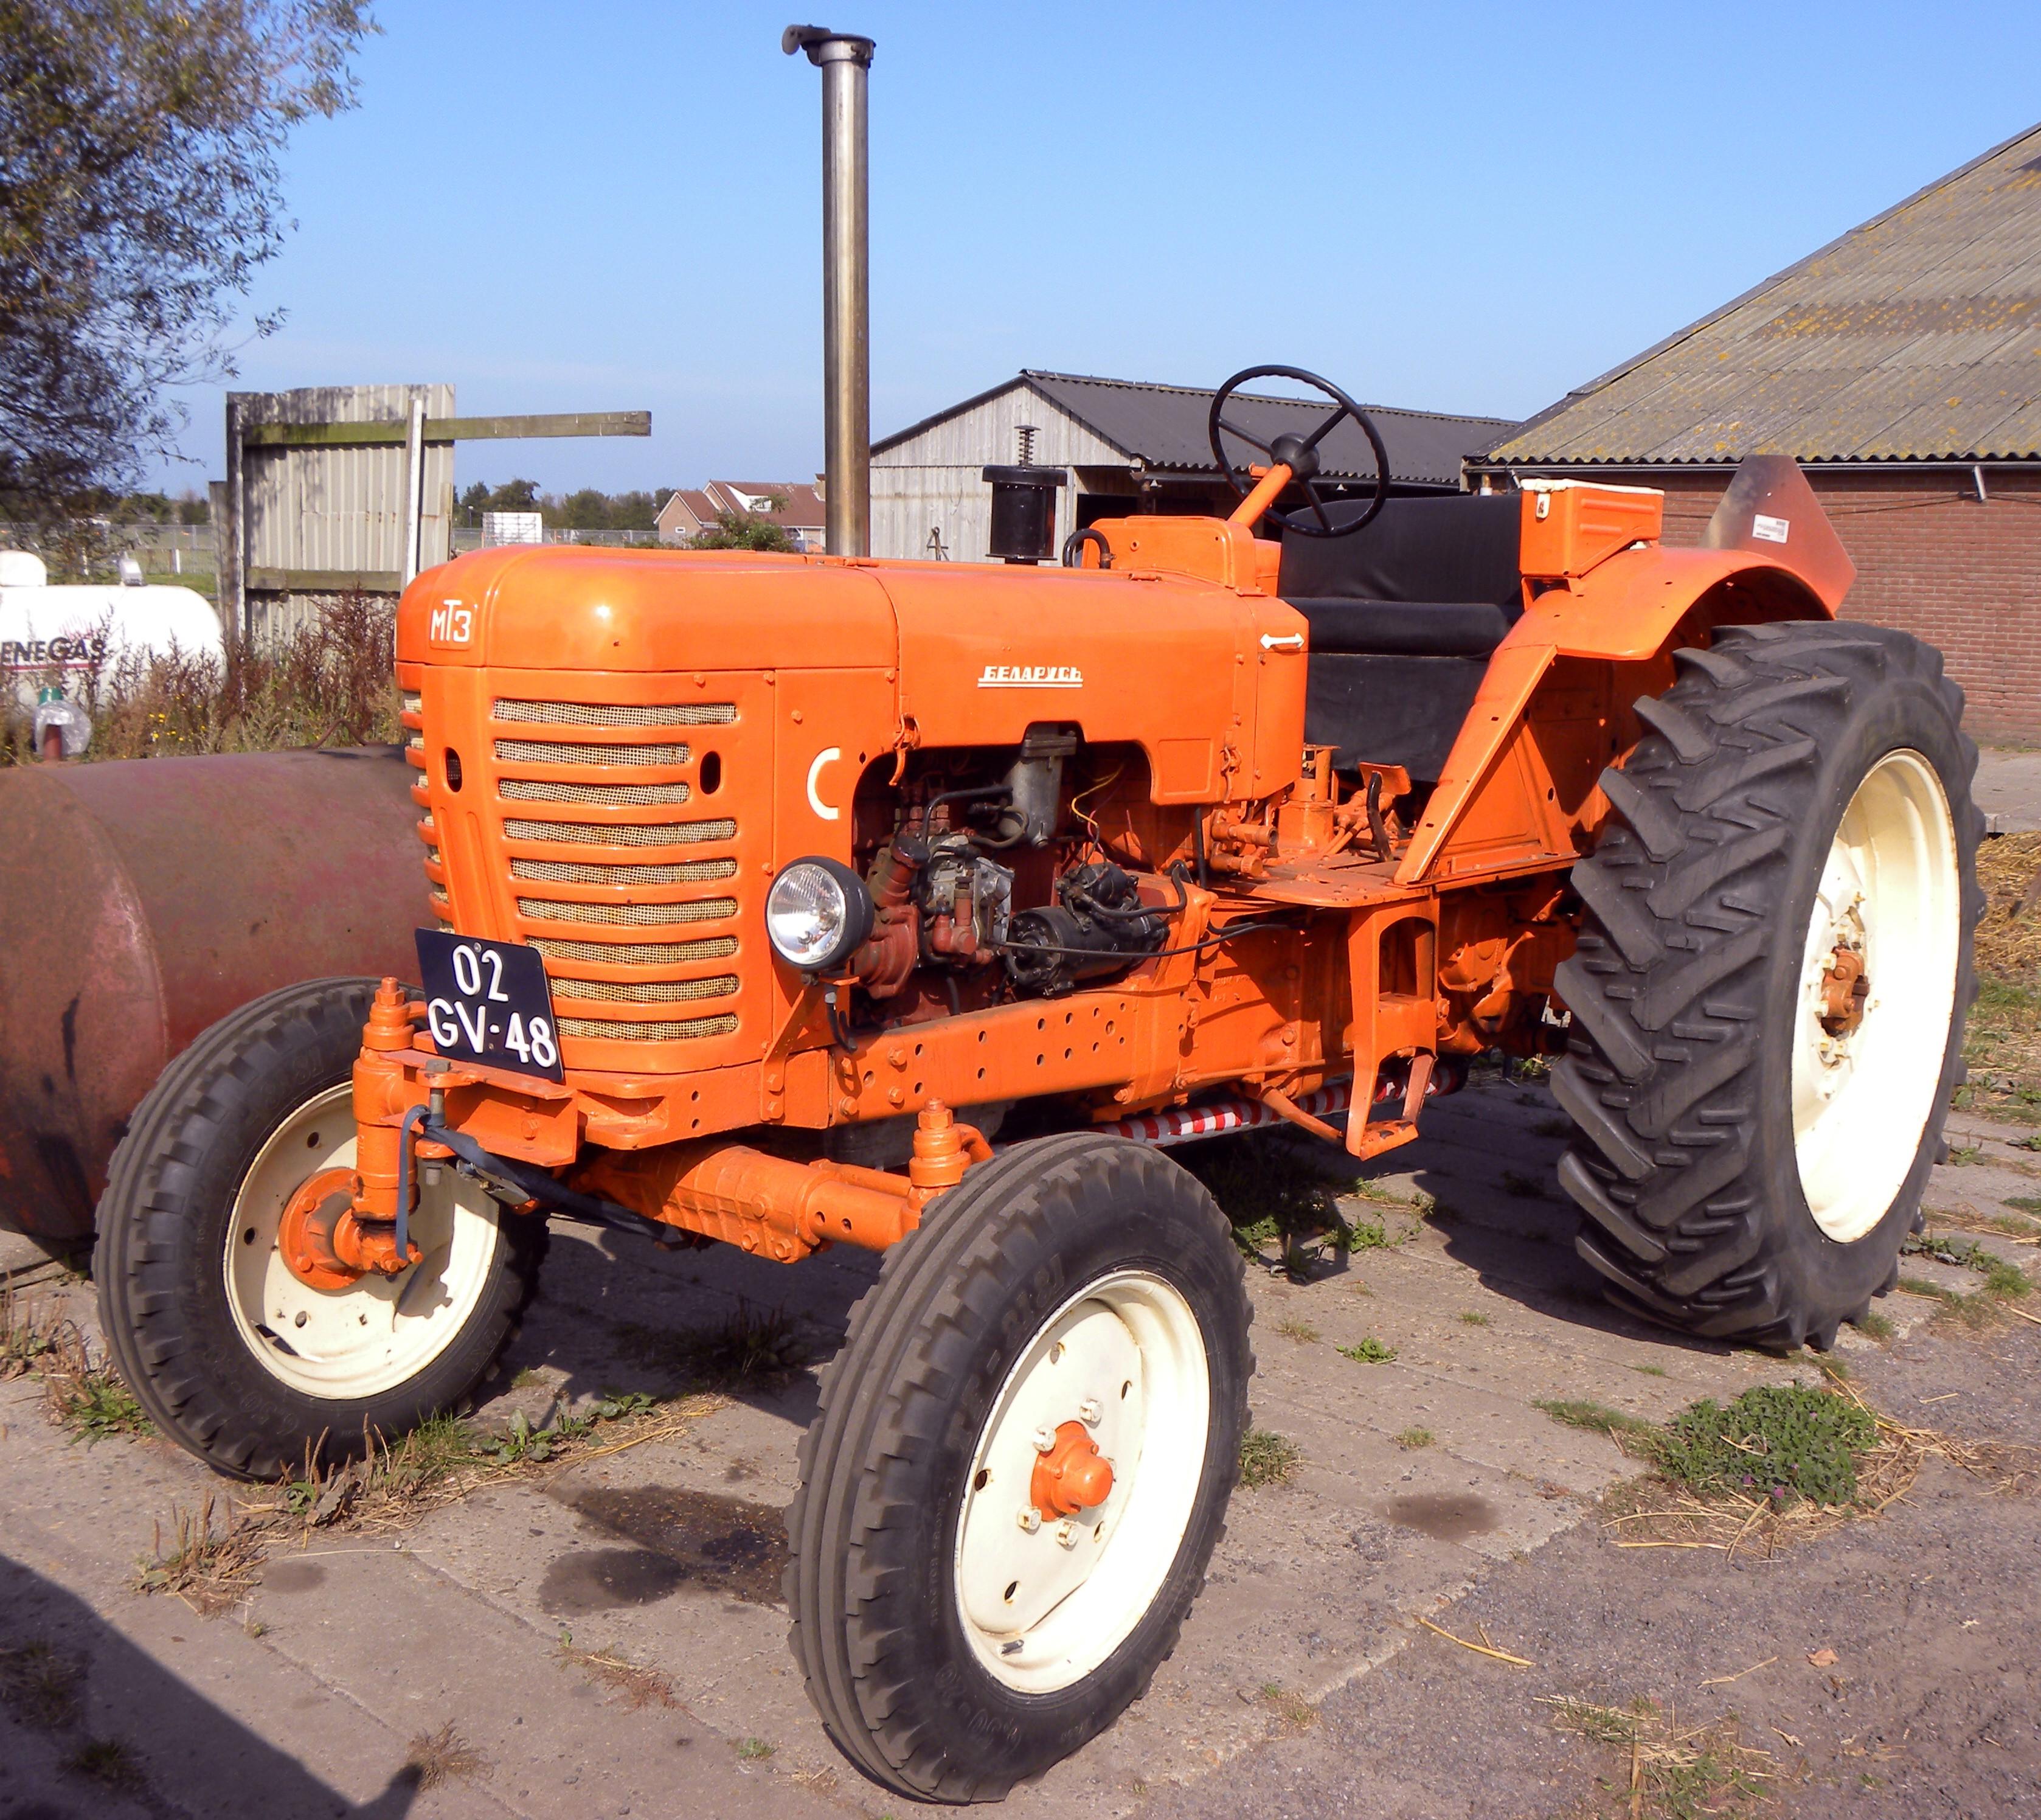 File Orange Belarus Tractor Jpg Wikimedia Commons